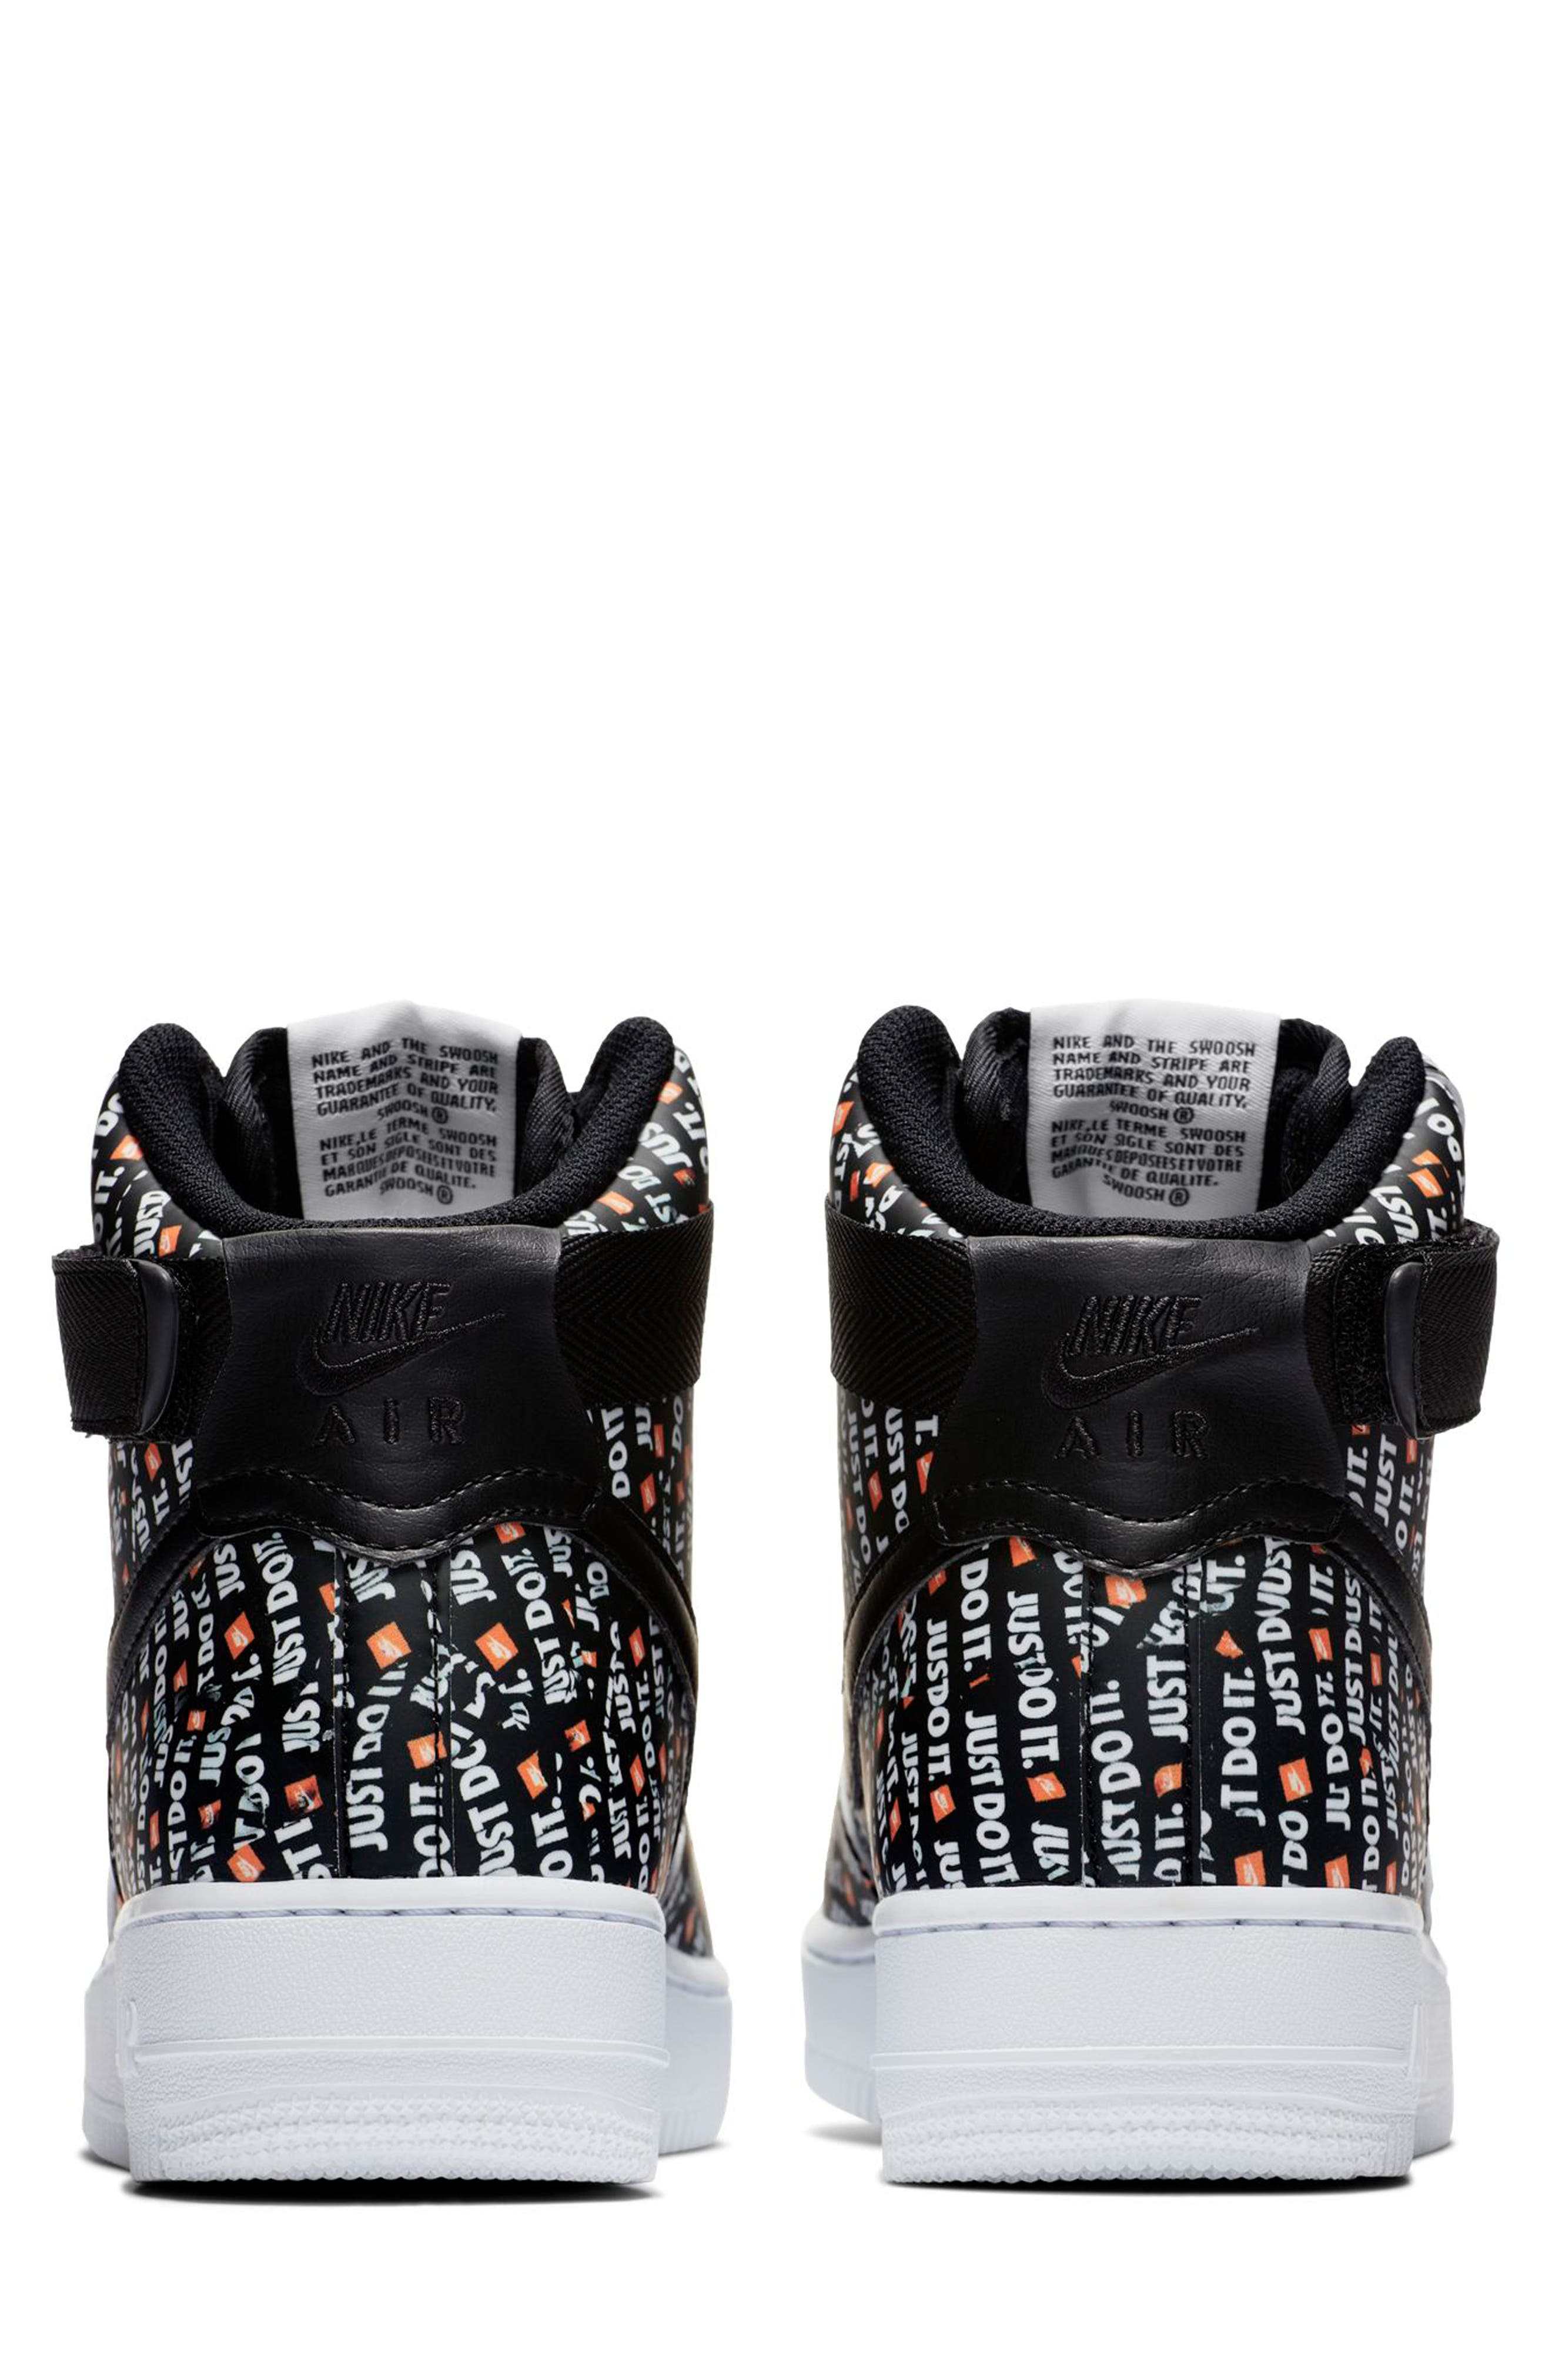 Air Force 1 High LX High Top Sneaker,                             Alternate thumbnail 2, color,                             BLACK